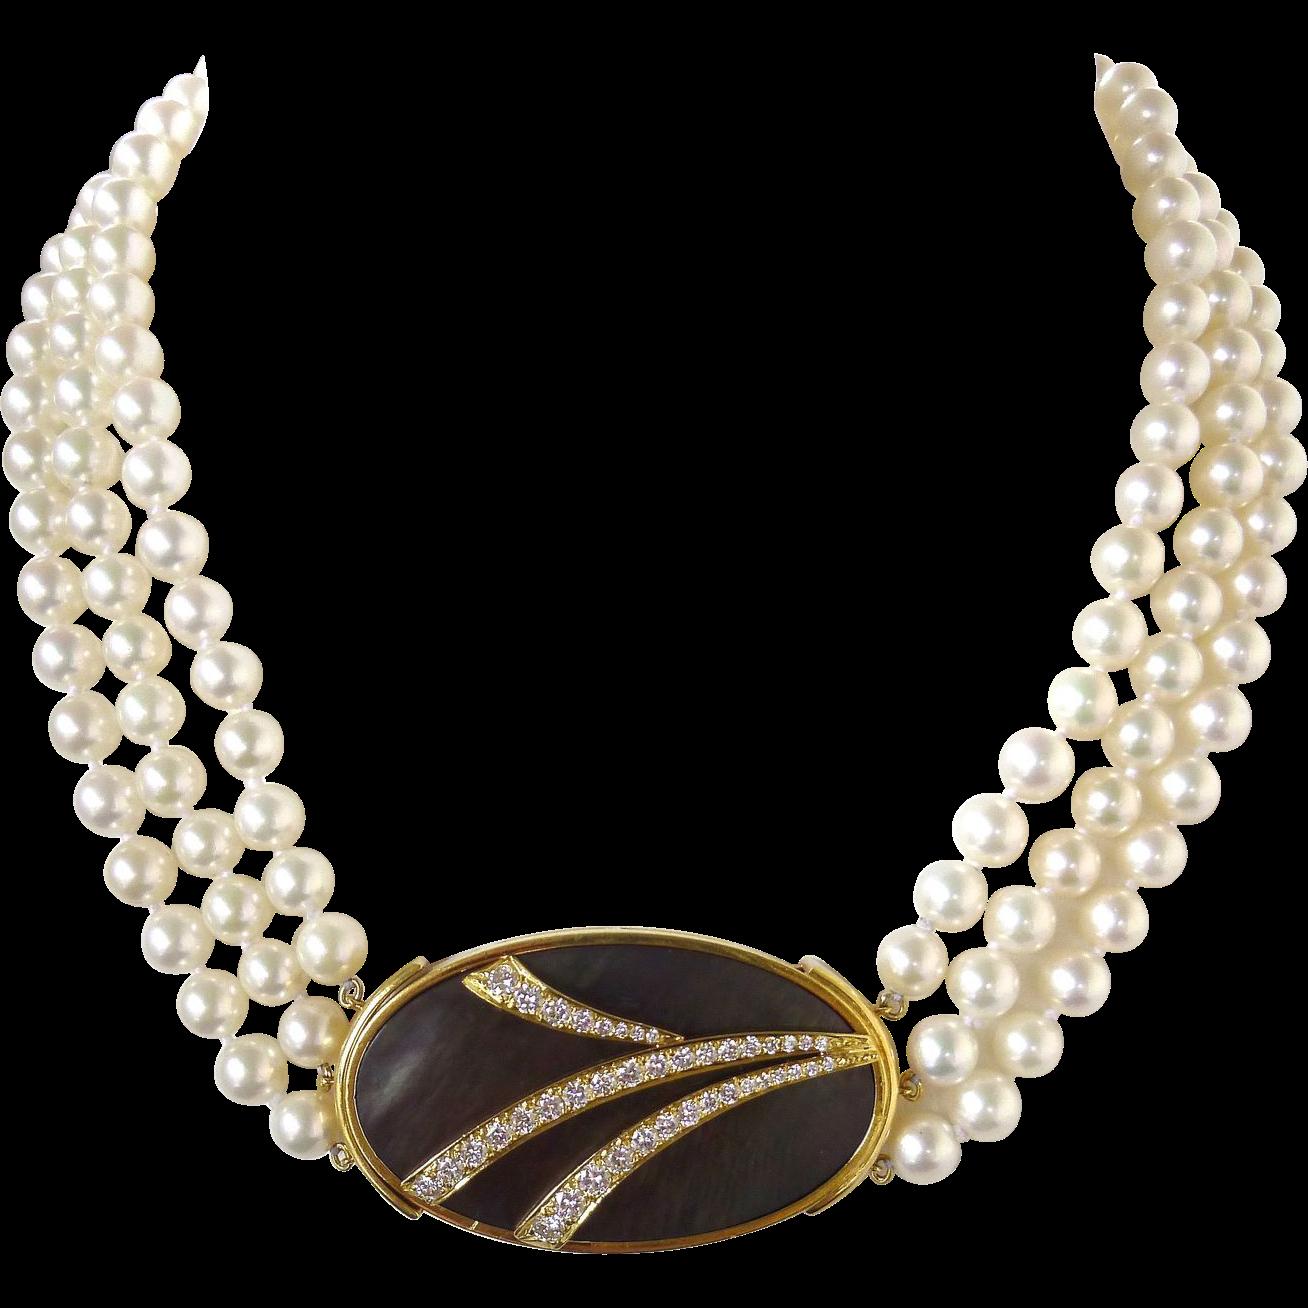 Triple Strand Akoya Cultured Pearl Choker Necklace & 150 Carat Diamond  Mother Of Pearl Pendant